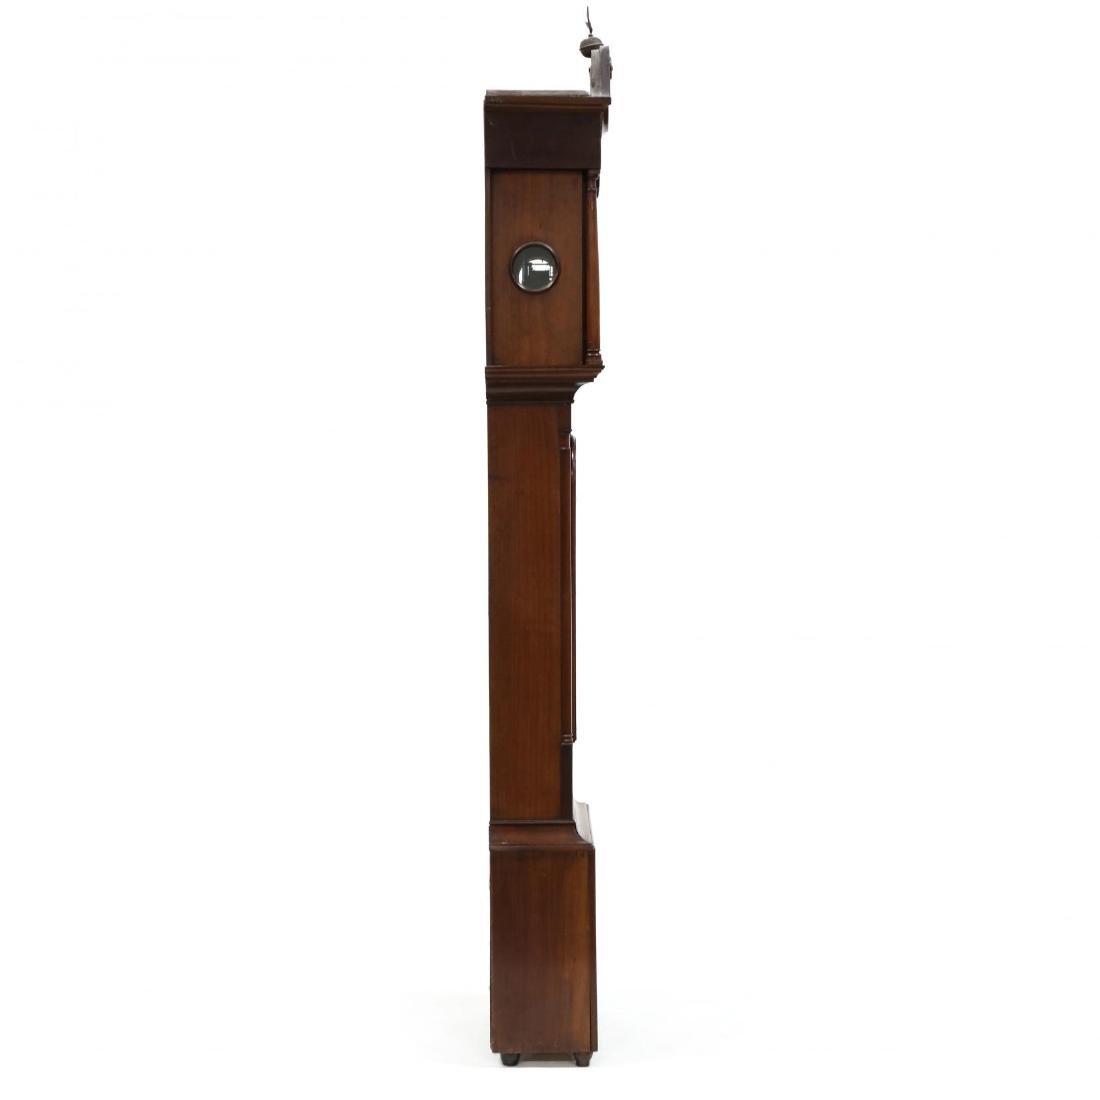 Scottish Mahogany Tall Case Clock, Hay Mercer, Aberdeen - 7